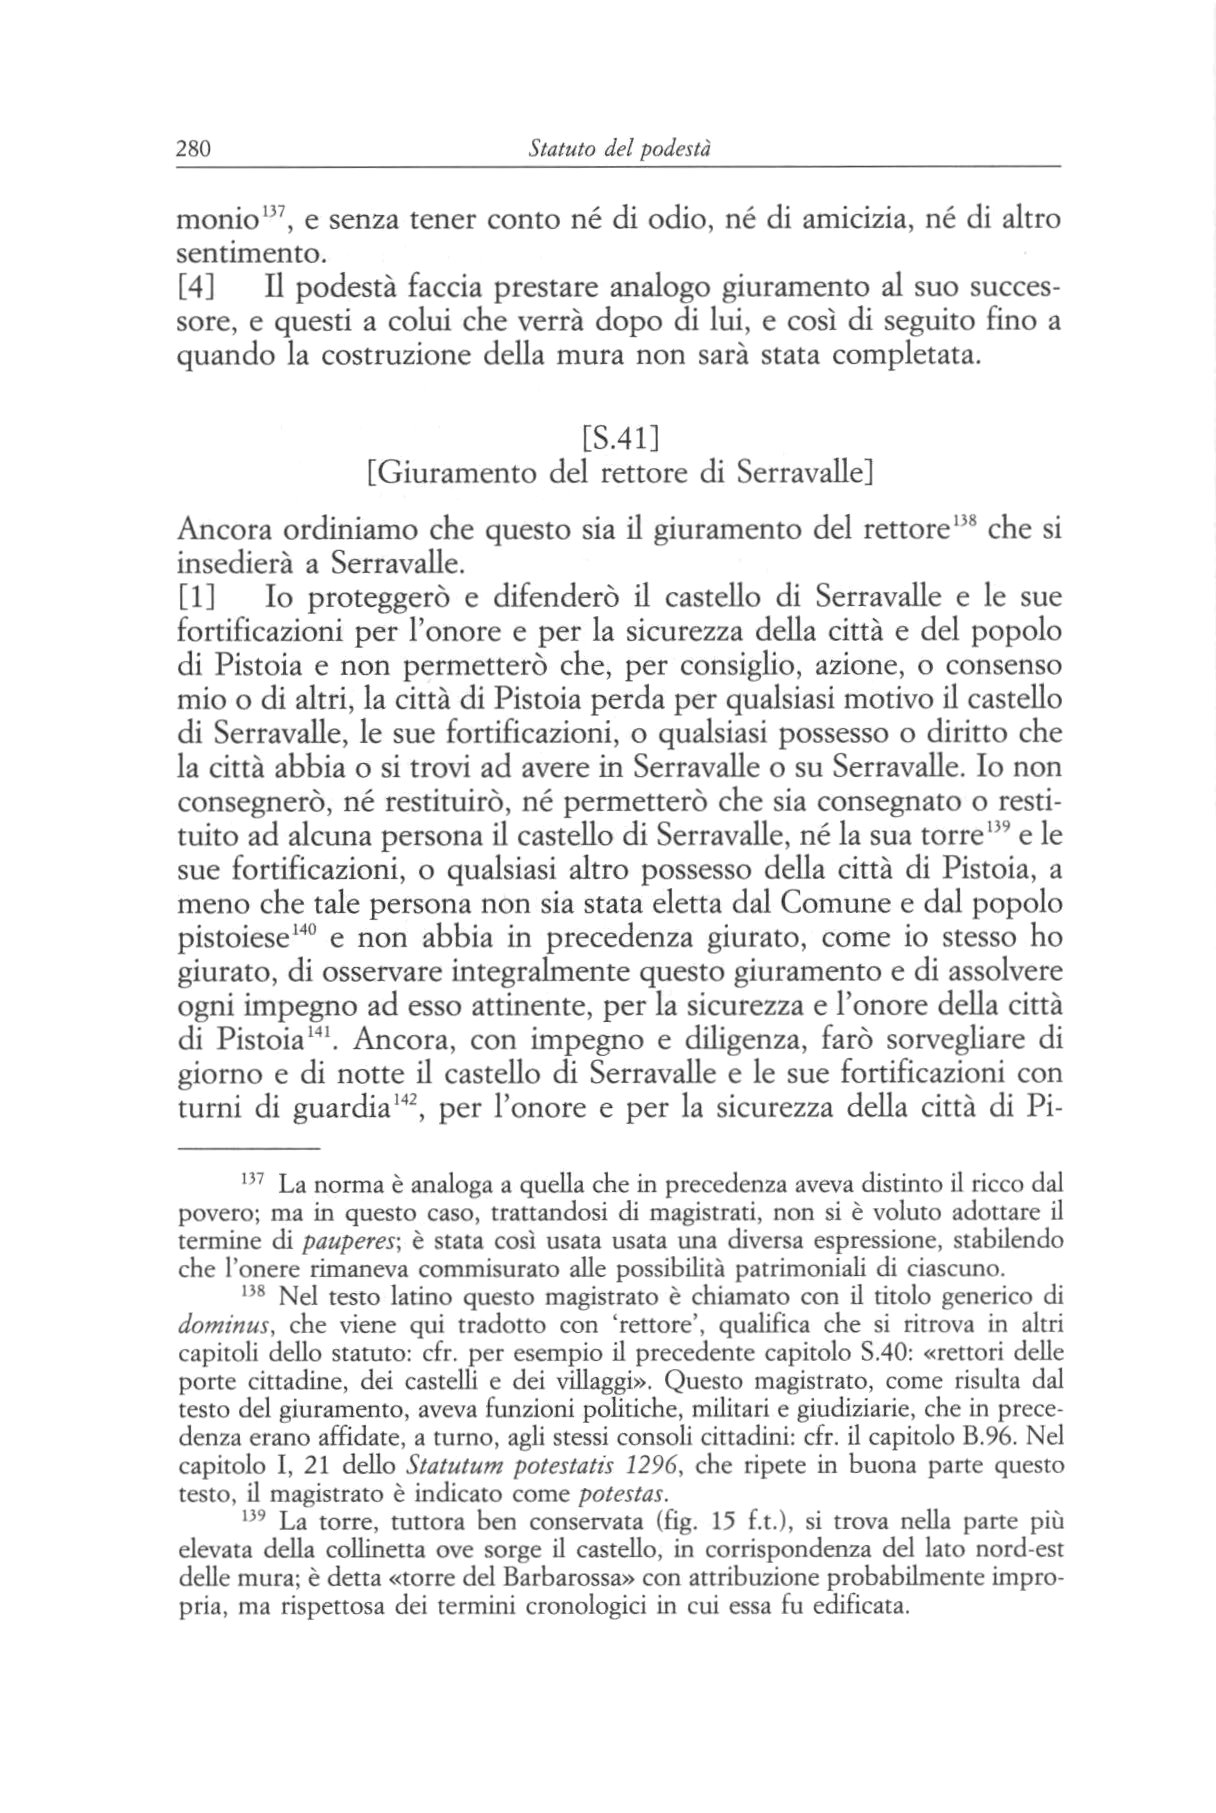 statuti pistoiesi del sec.XII 0280.jpg